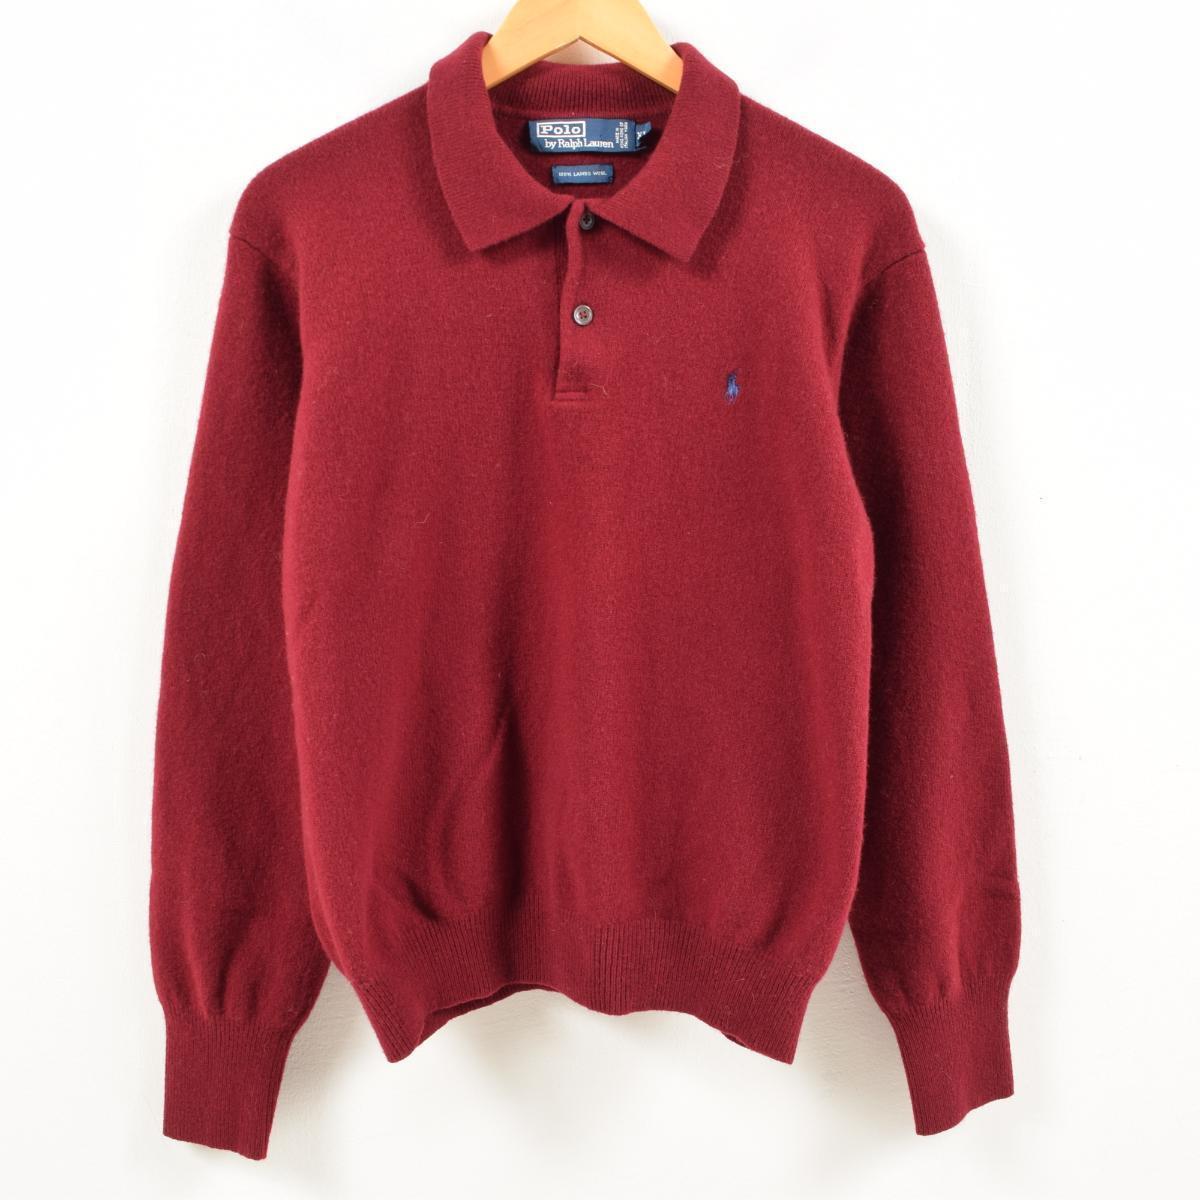 Ralph Lauren Polo By Long Sleeves Lamb S Wool Knit Shirt Men M Wax2529